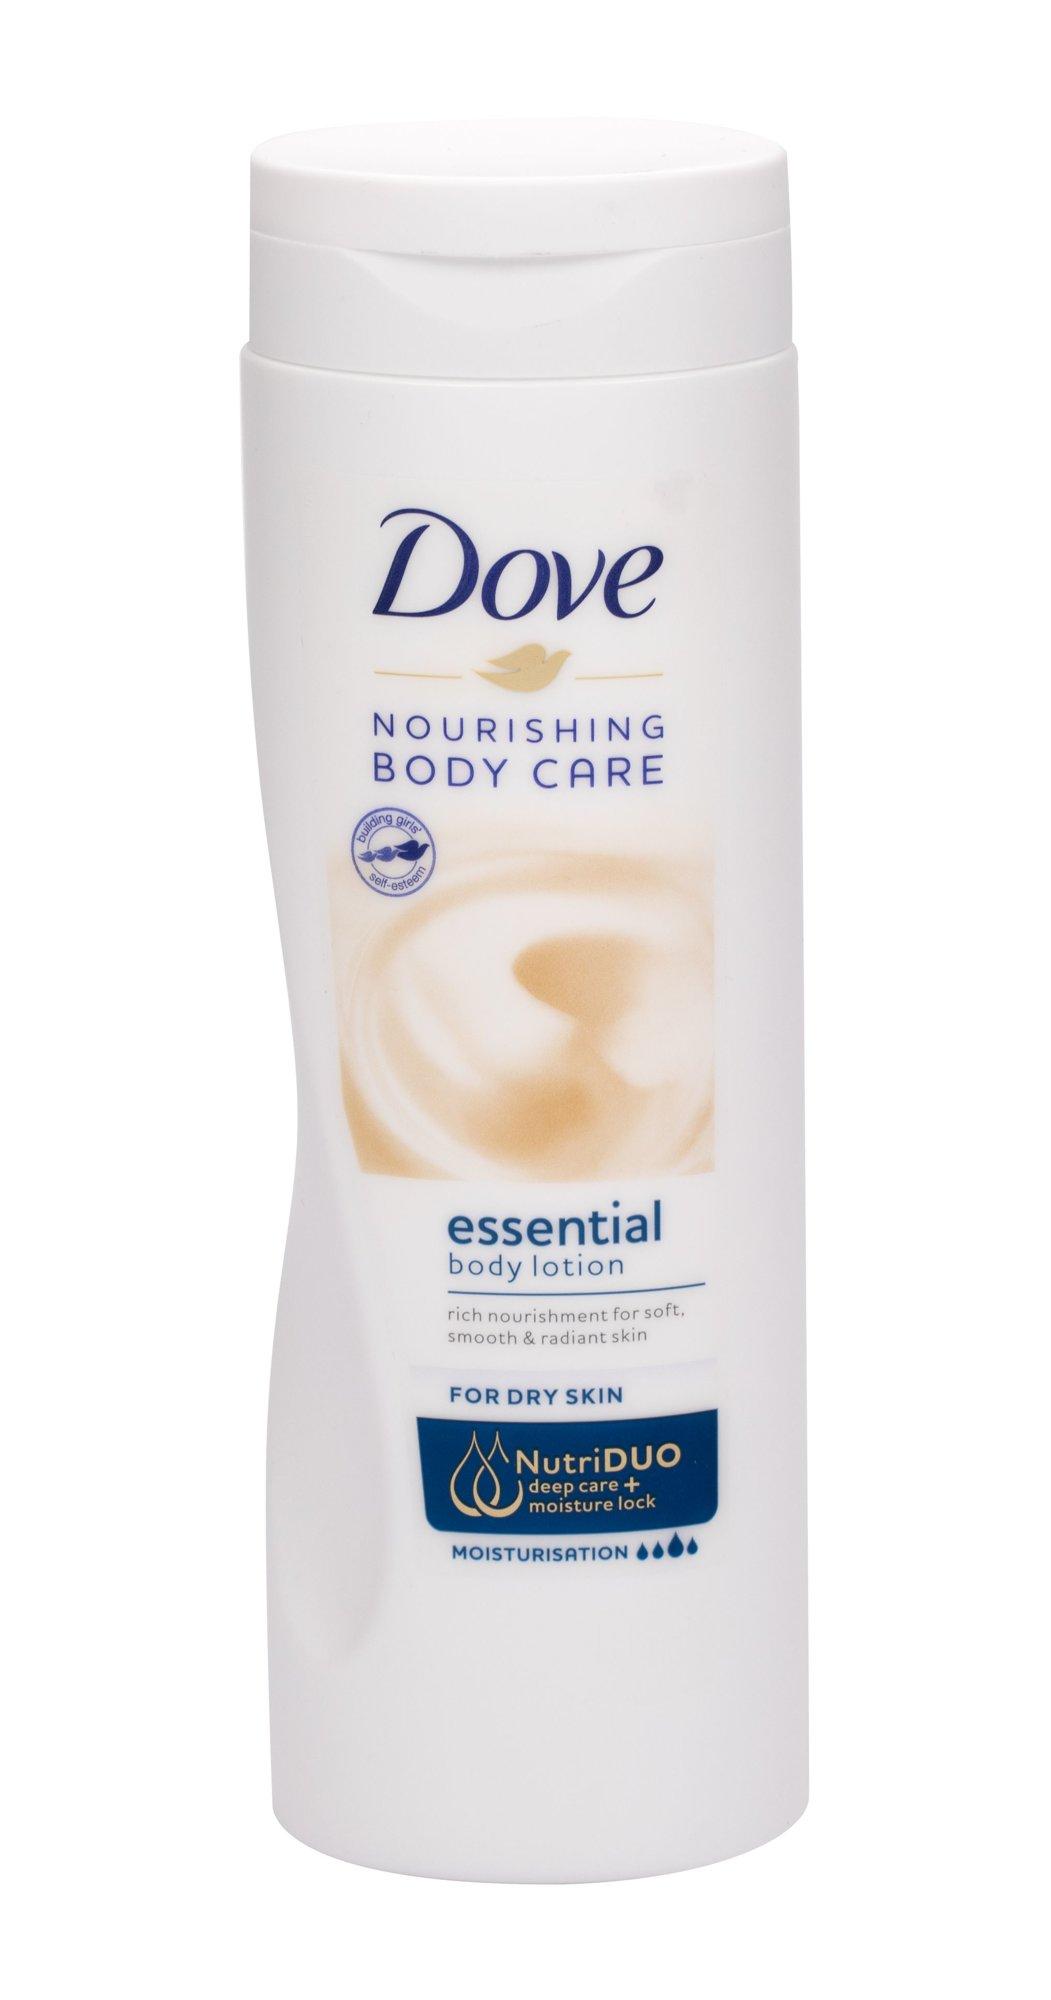 Kūno losjonas Dove Nourishing Body Care